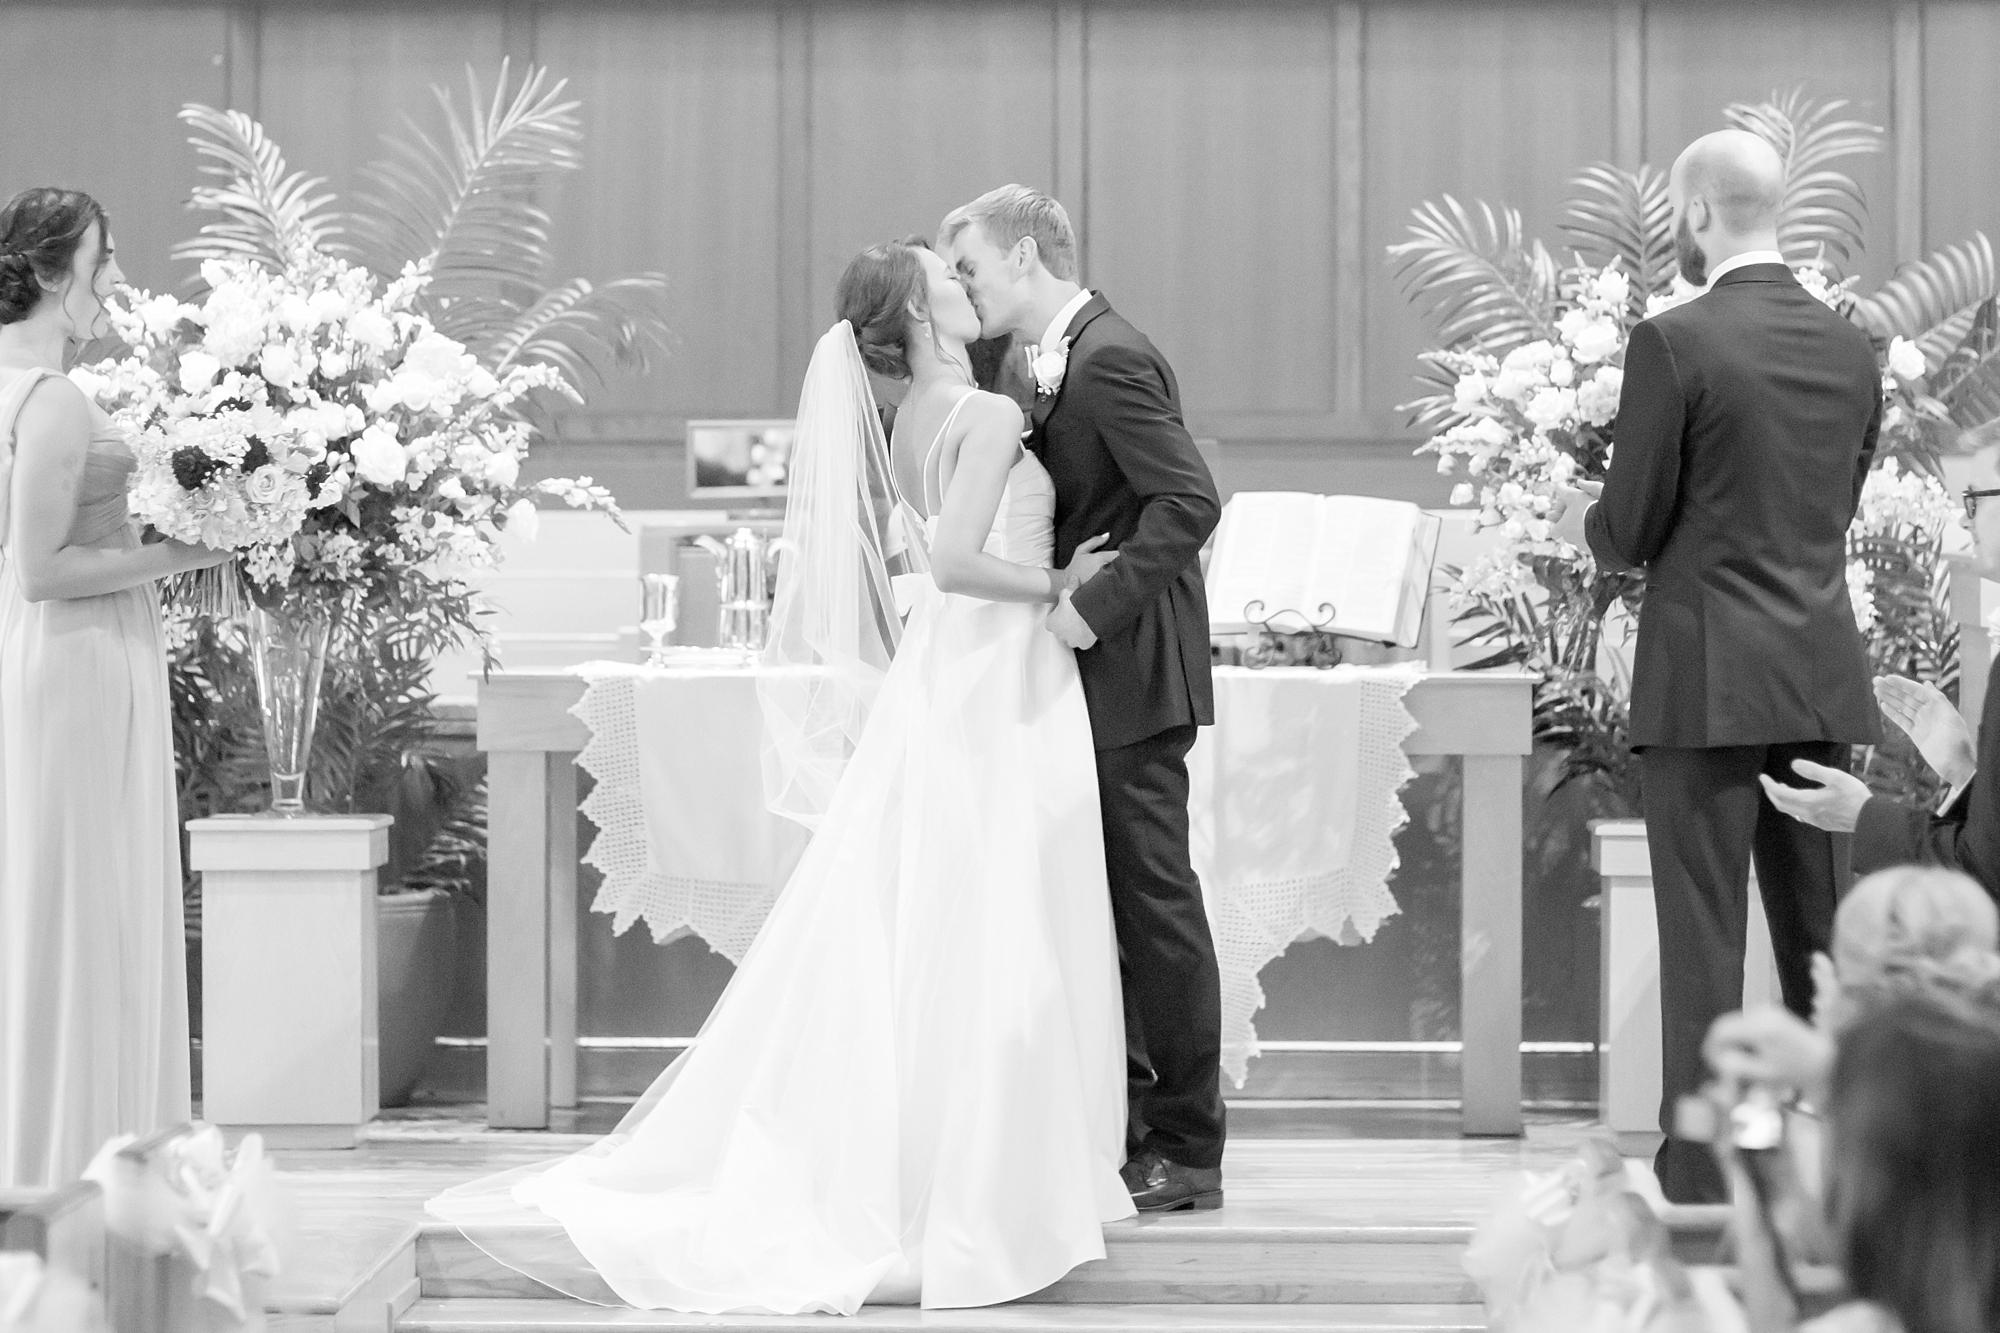 Russell 3-Ceremony-554_anna grace photography baltimore maryland wedding photographer elkridge furnace inn wedding photo.jpg